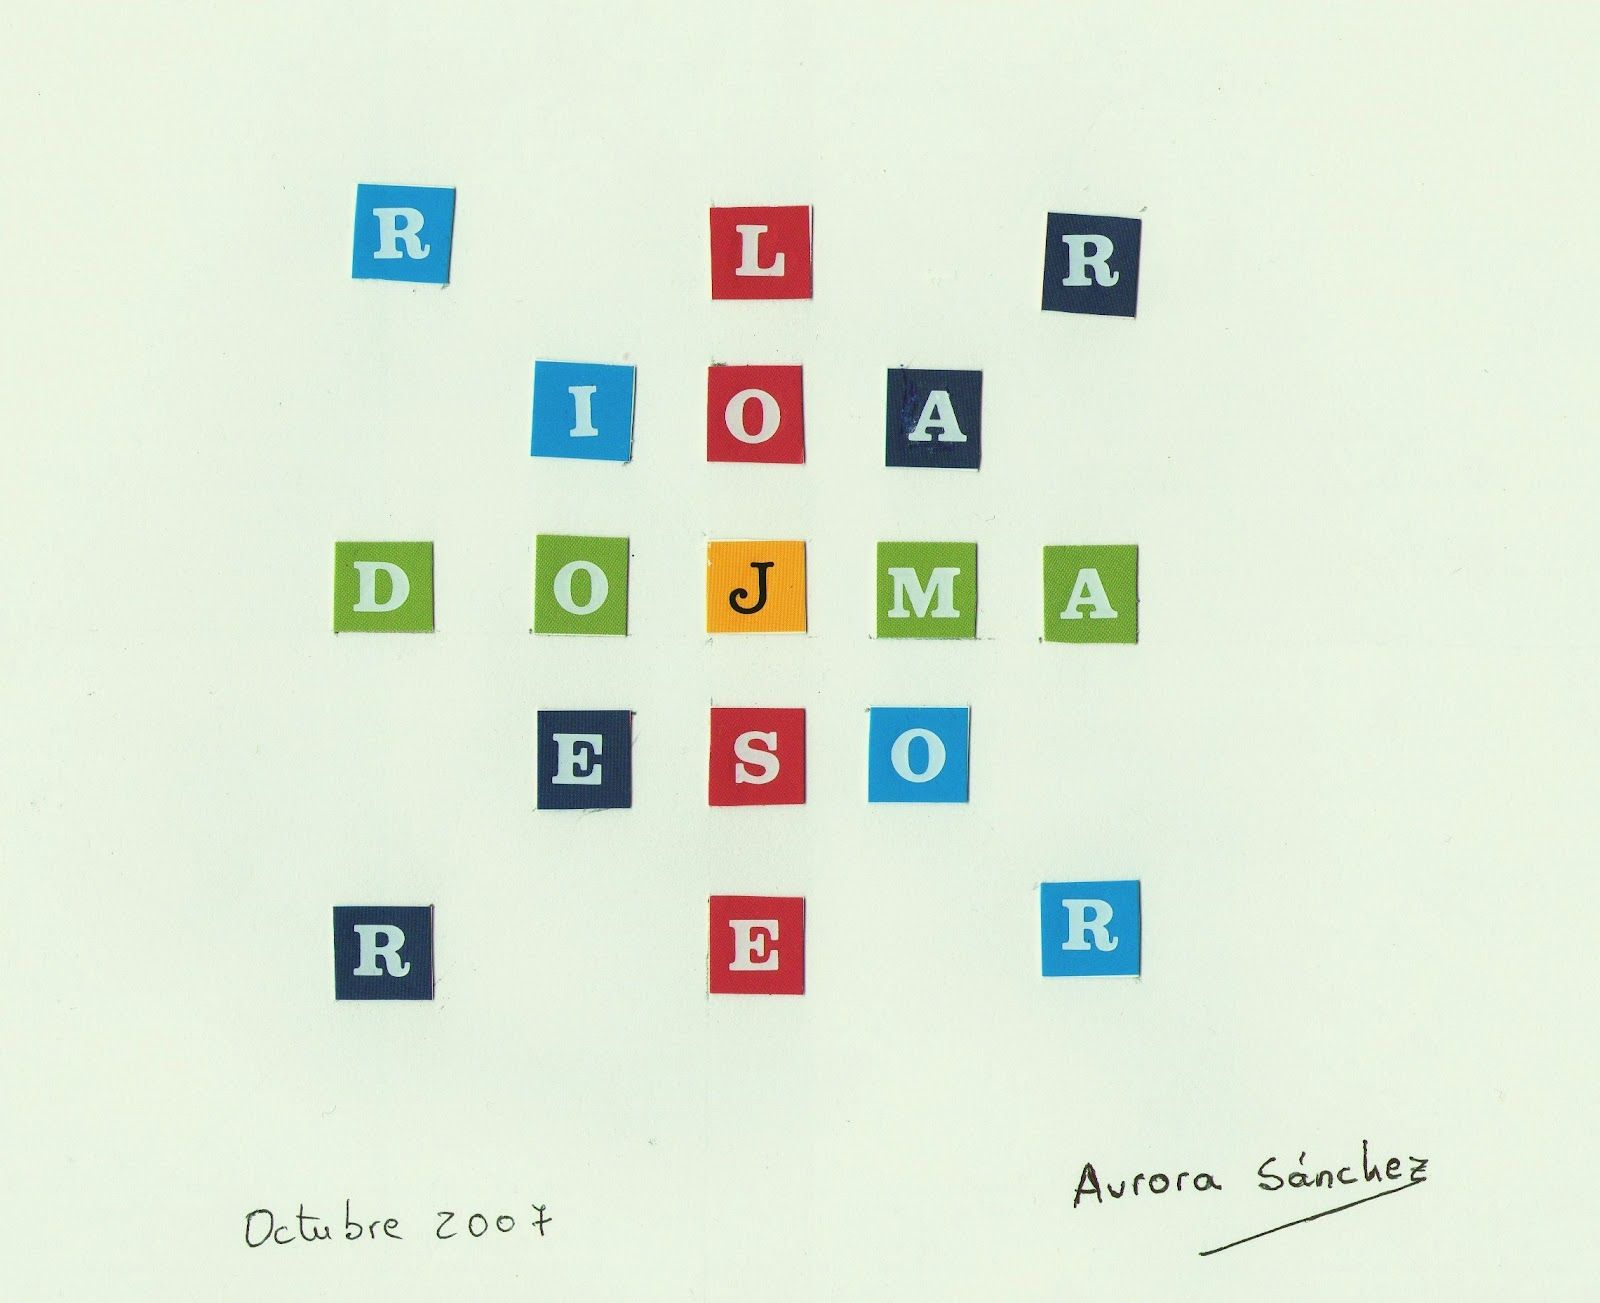 Auro (Aurora Sánchez Fernández), poeta visual